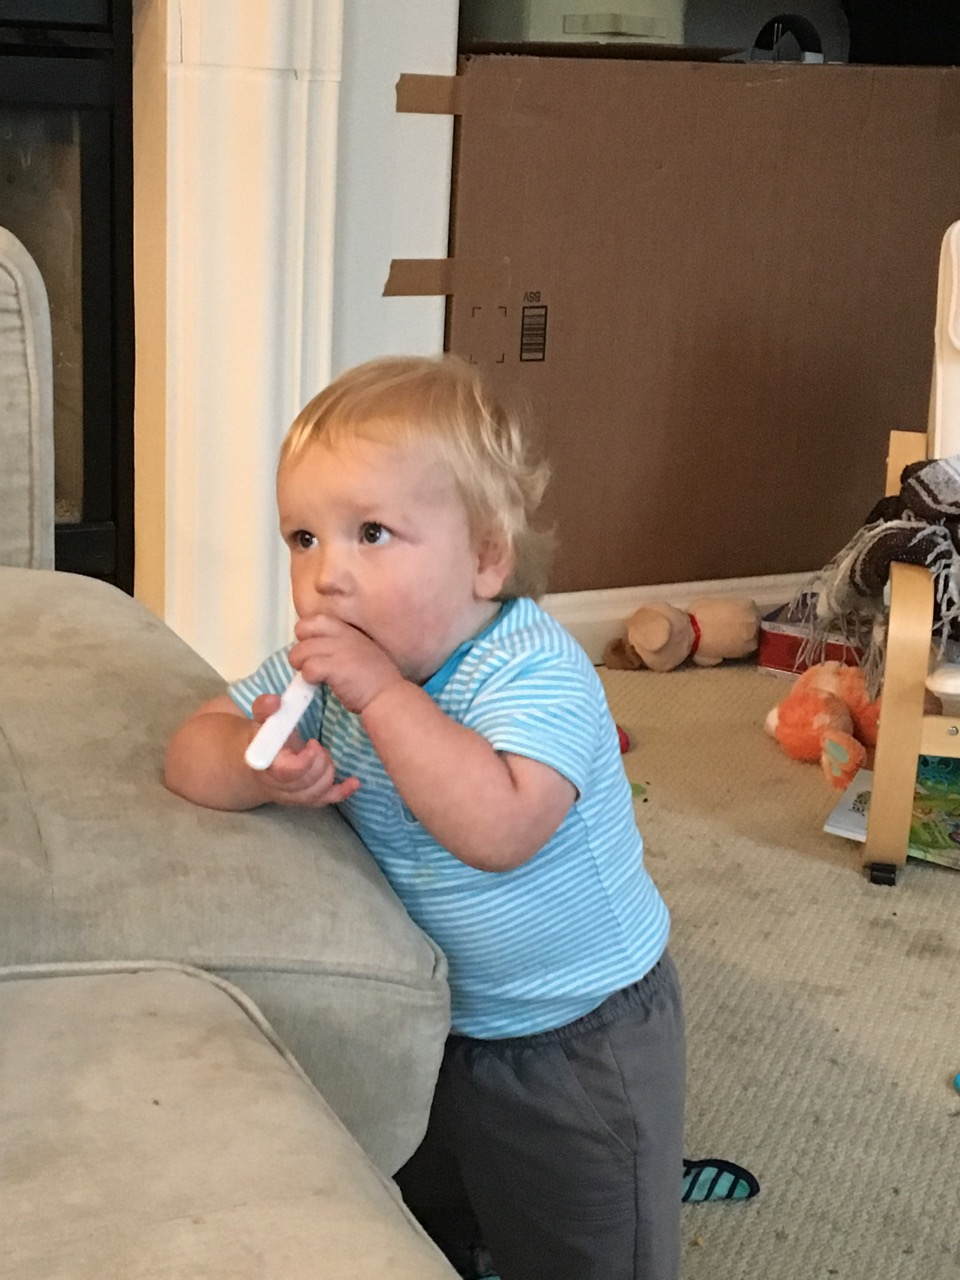 Stealing big brother's yogurt spoon